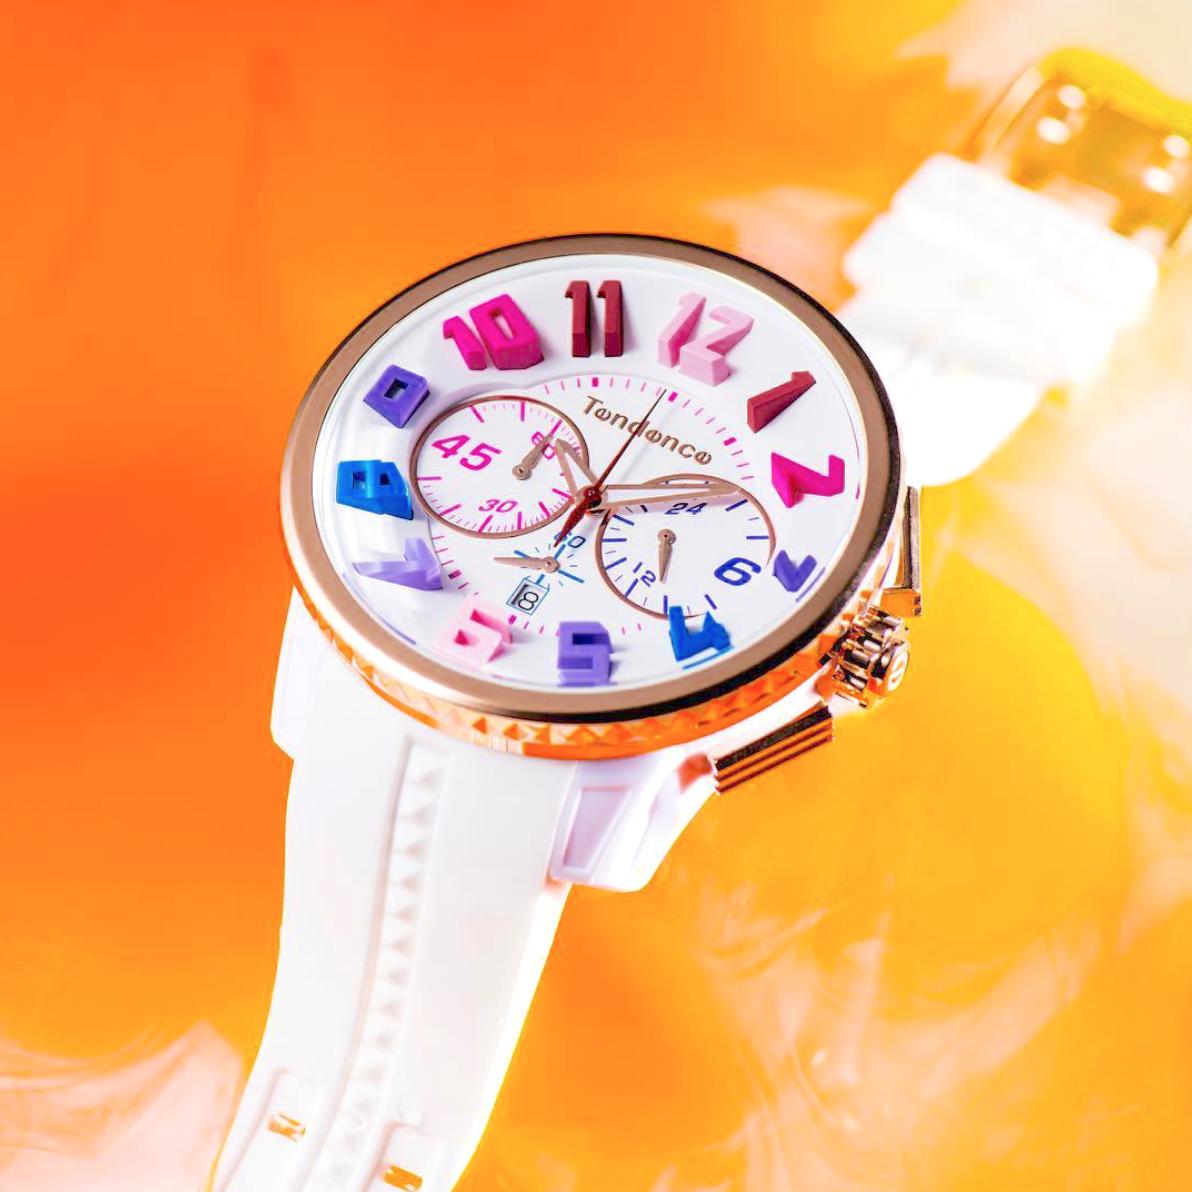 【Tendence テンデンス】TY460614 GULLIVER RAINBOW  ガリバーレインボー(ホワイト)/正規輸入品